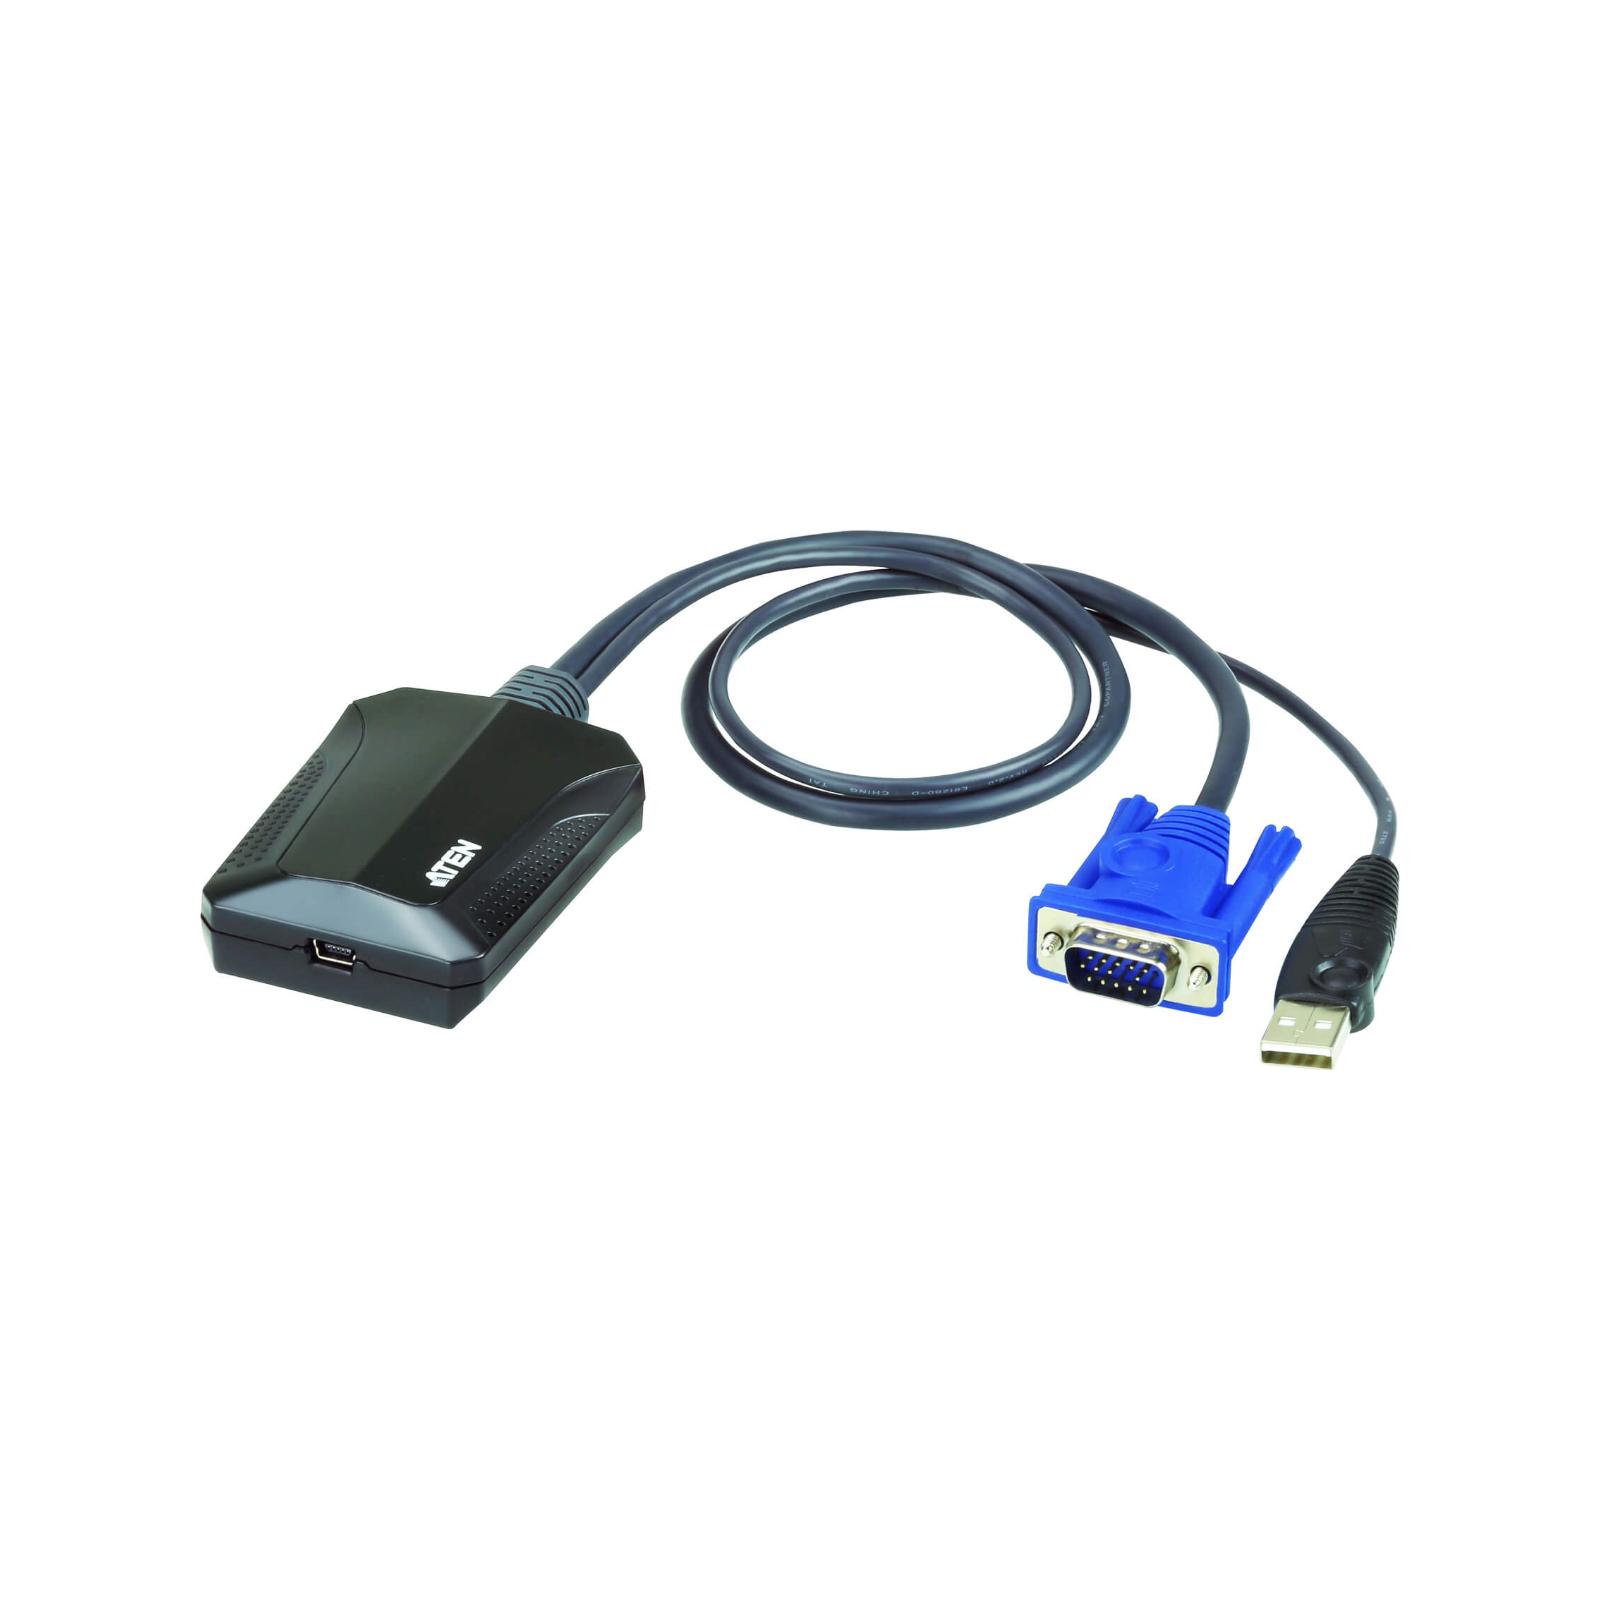 Aten-CV211-AT-Aten-CV211-AT-CV211-AT-ADAPTER | Laptop Mechanic